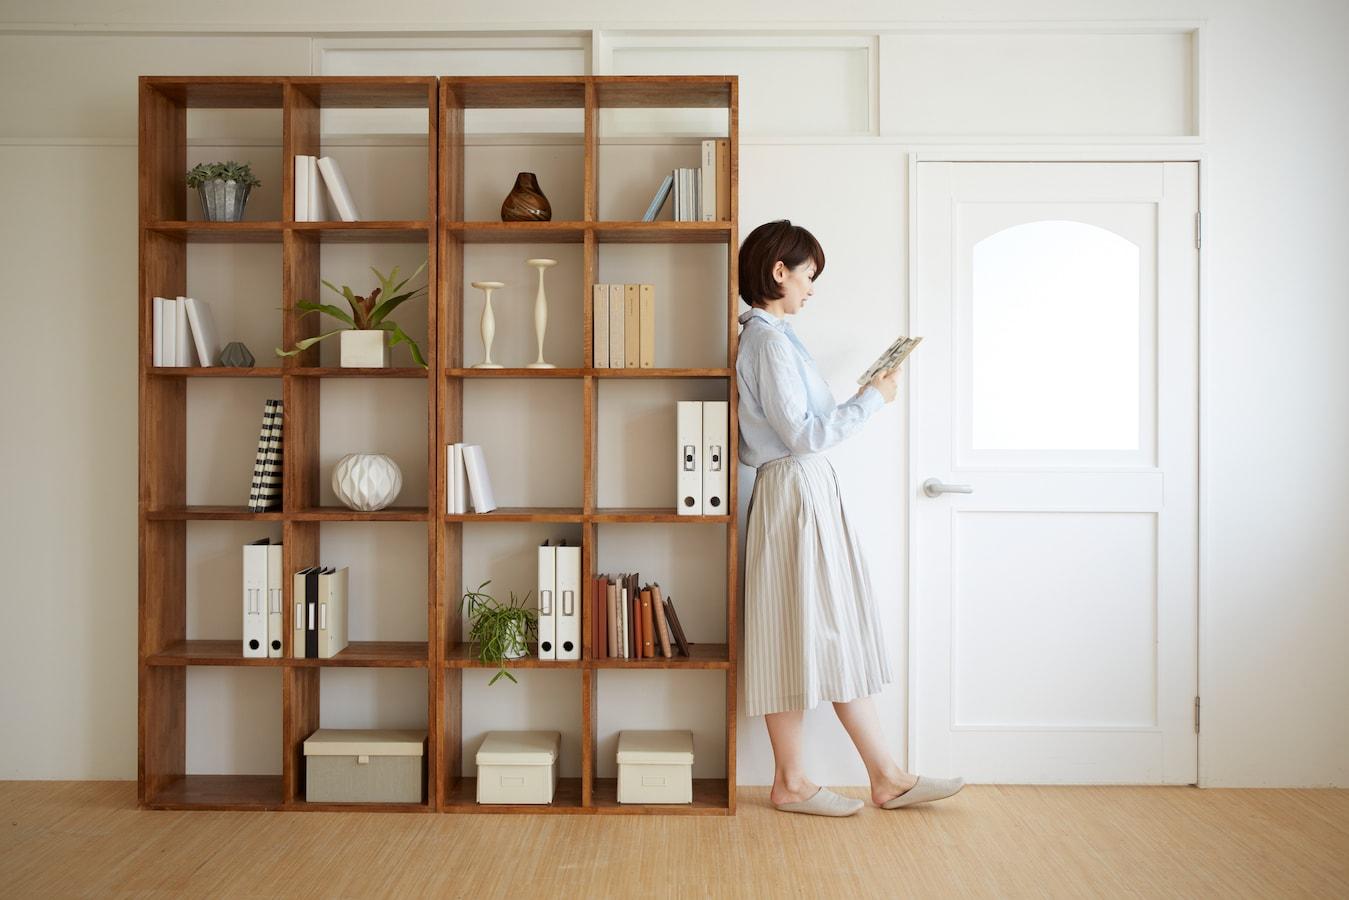 home - Magazine cover